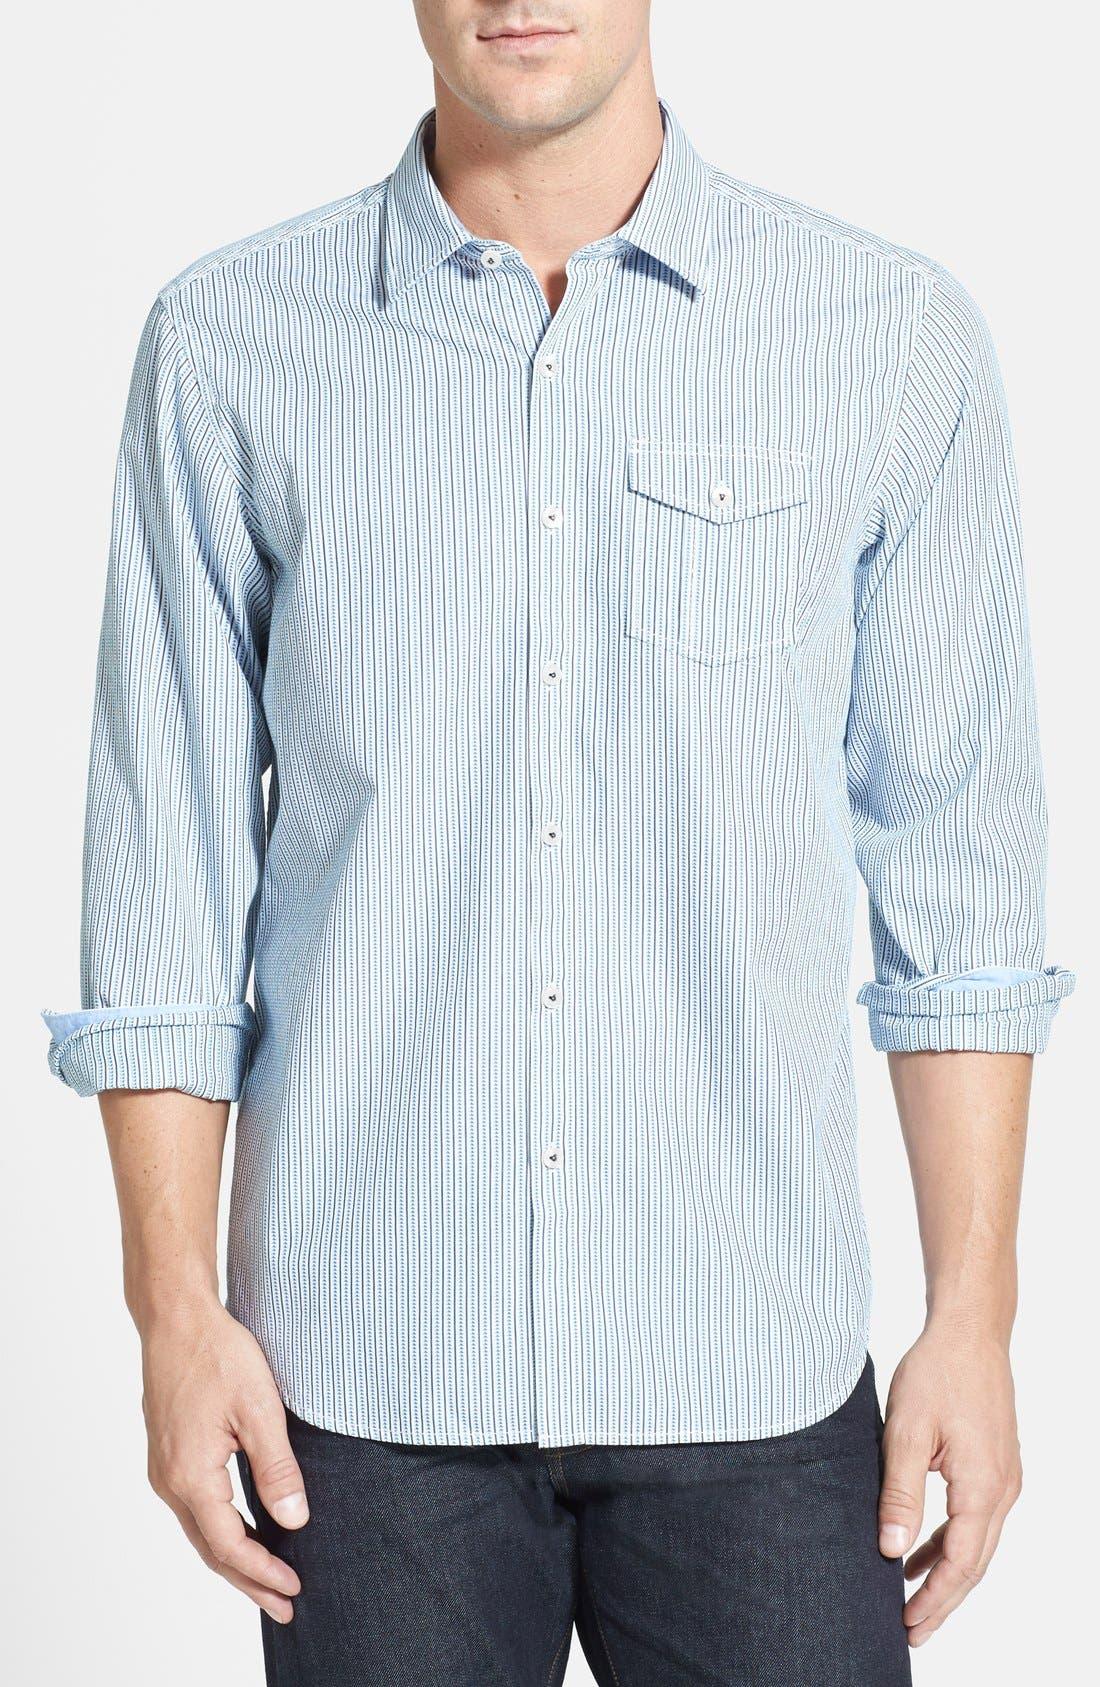 Alternate Image 1 Selected - Tommy Bahama Denim 'Tres Stripe' Island Modern Fit Sport Shirt